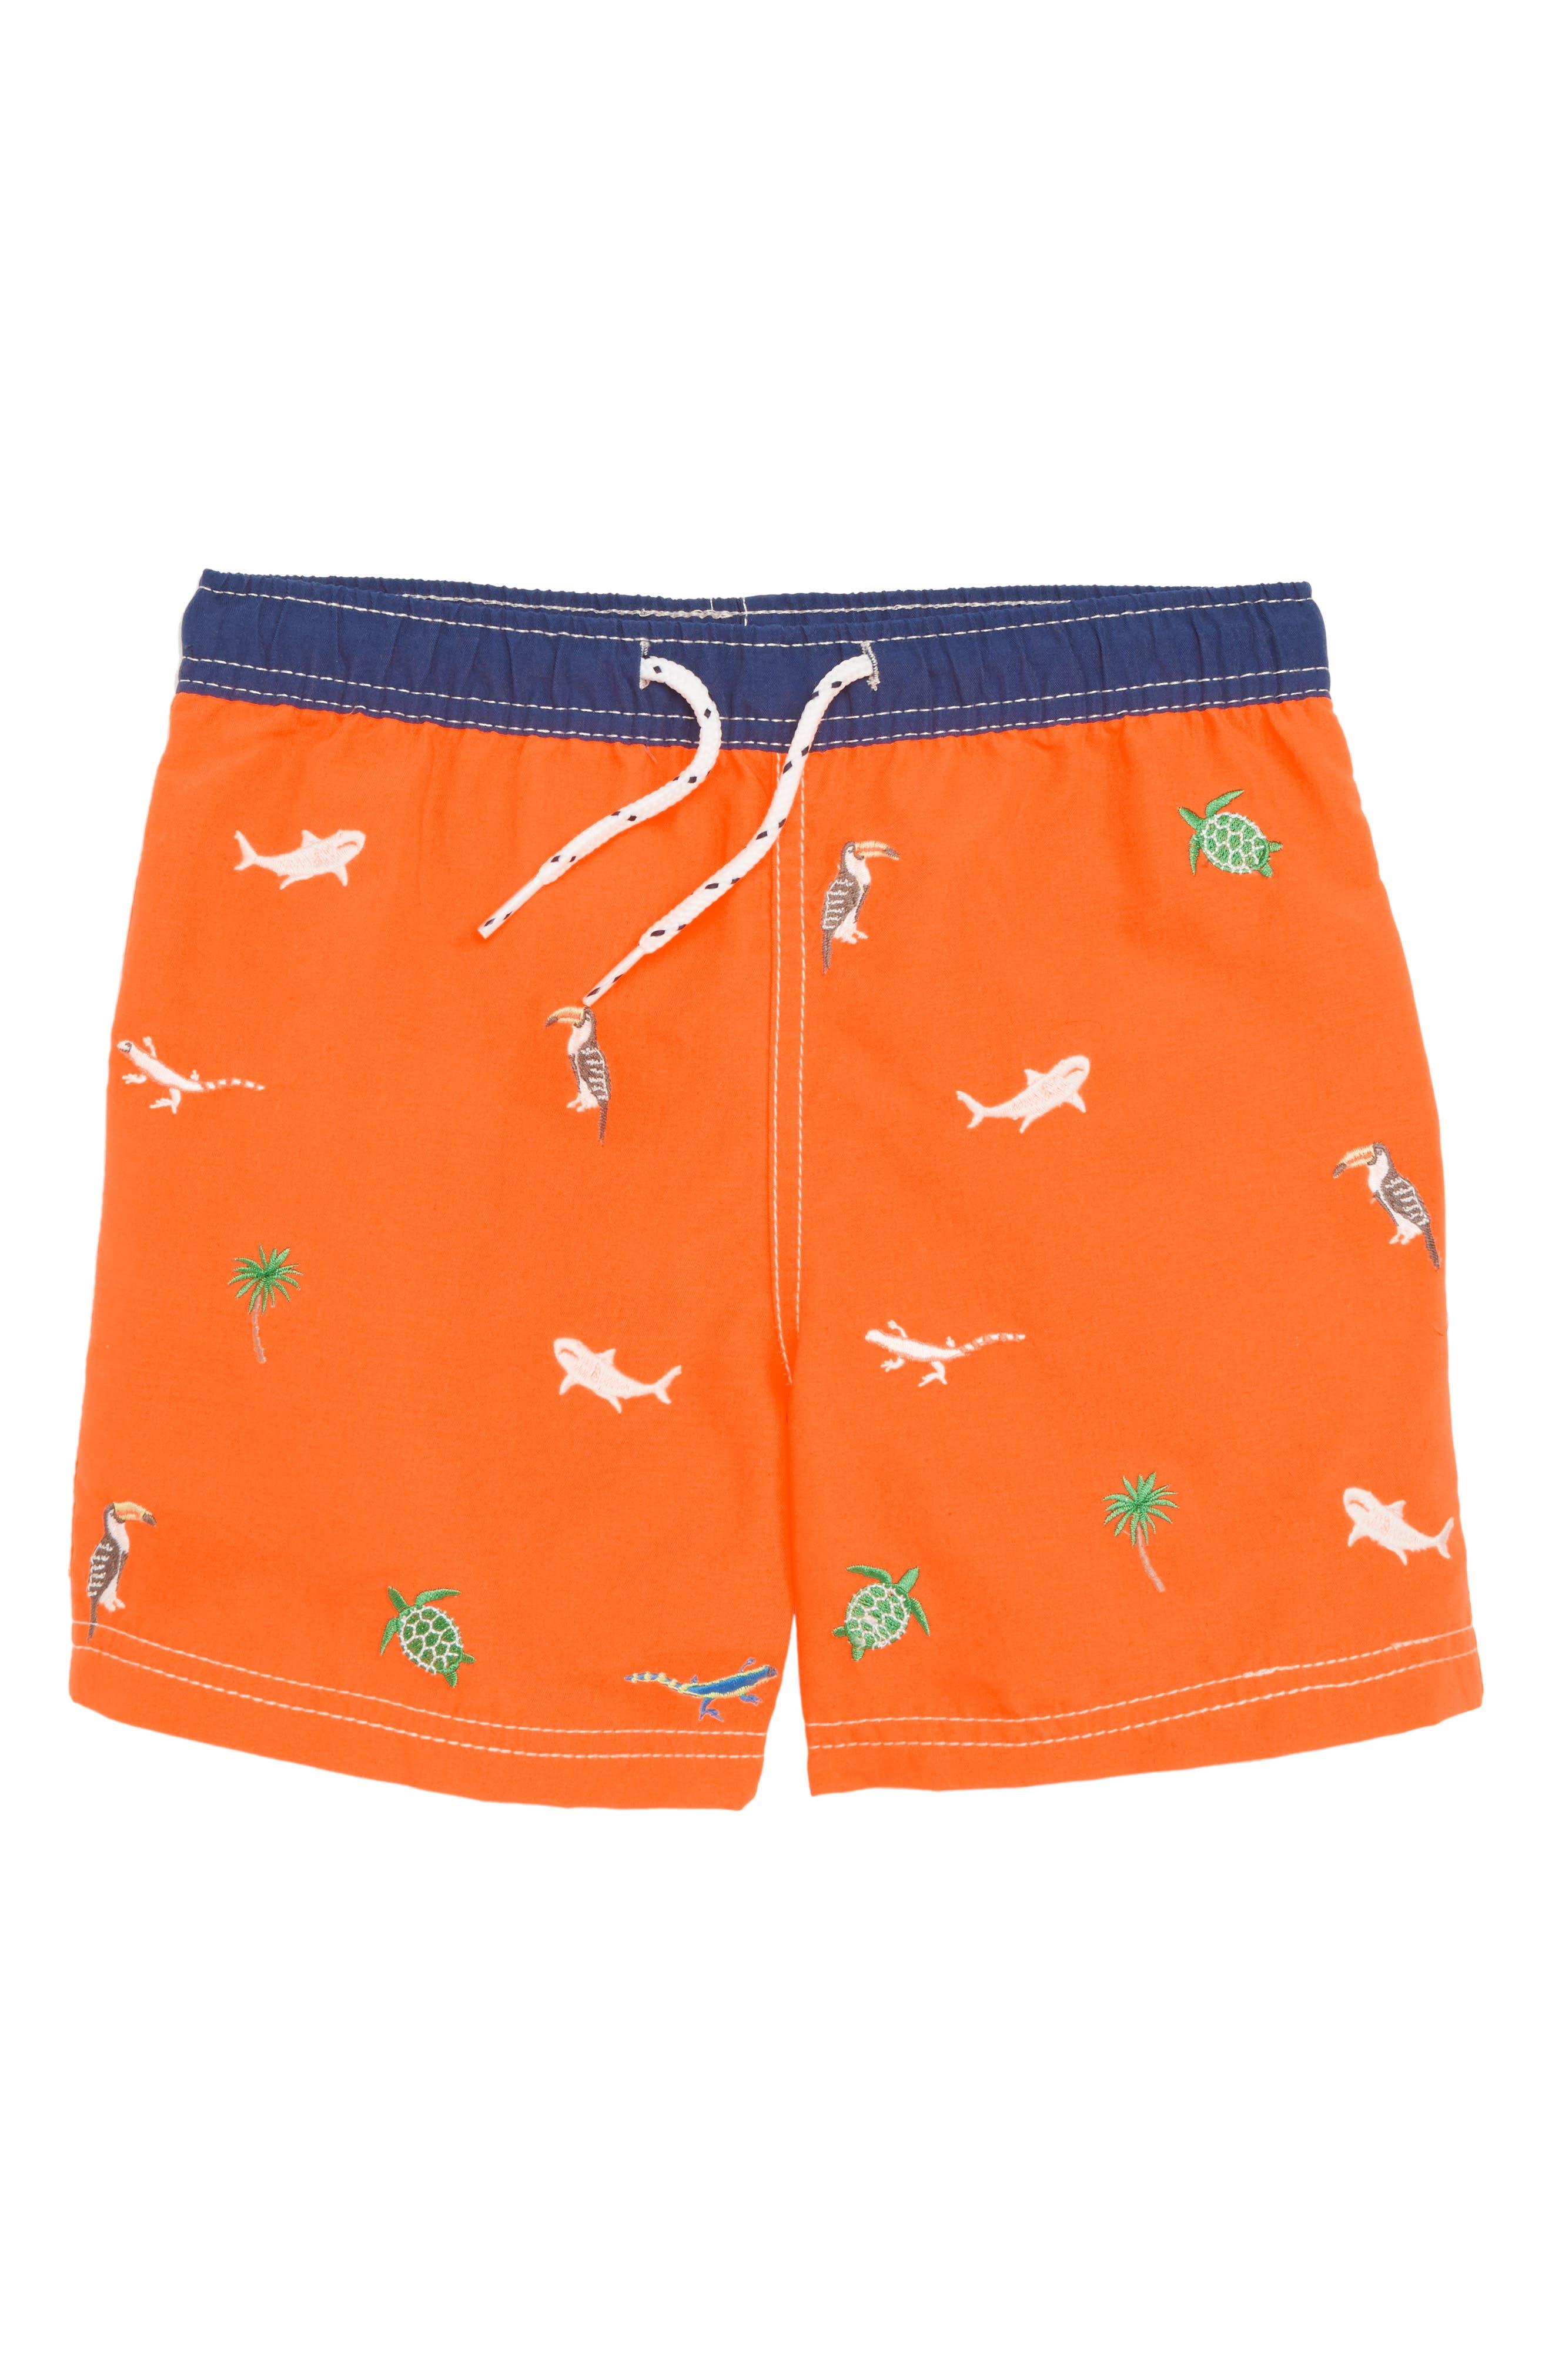 Embroidered Swim Trunks,                             Main thumbnail 1, color,                             Acid Orange Embroidery